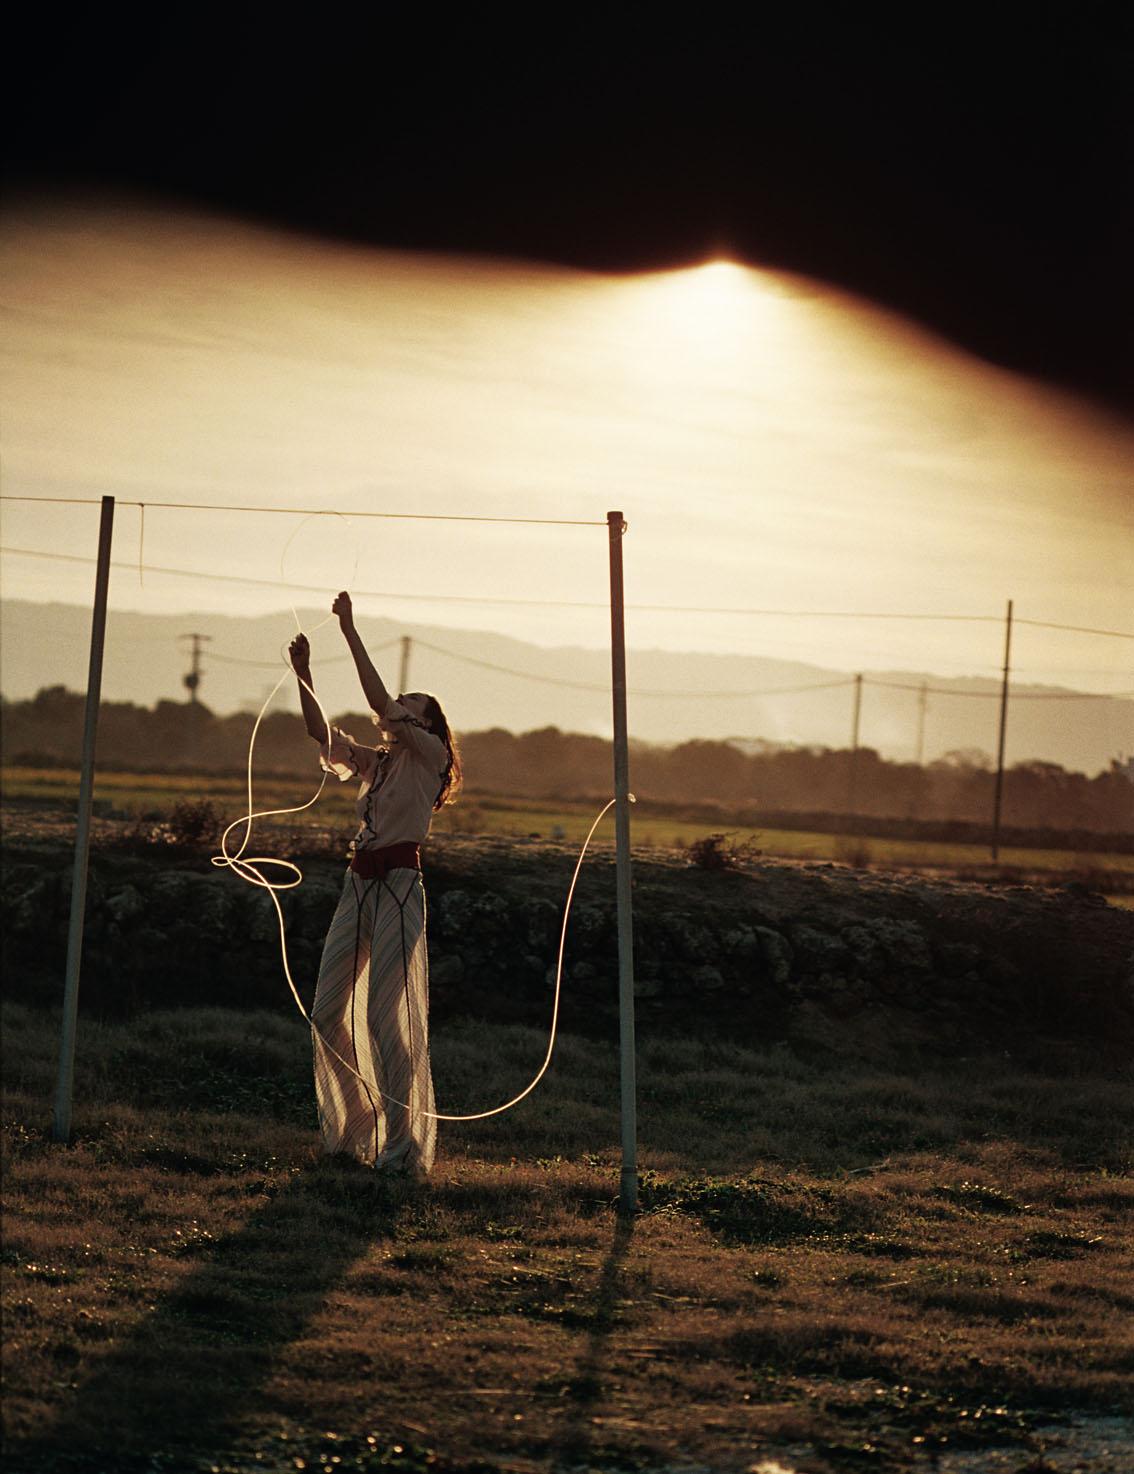 Foto di Toni Thorimbert